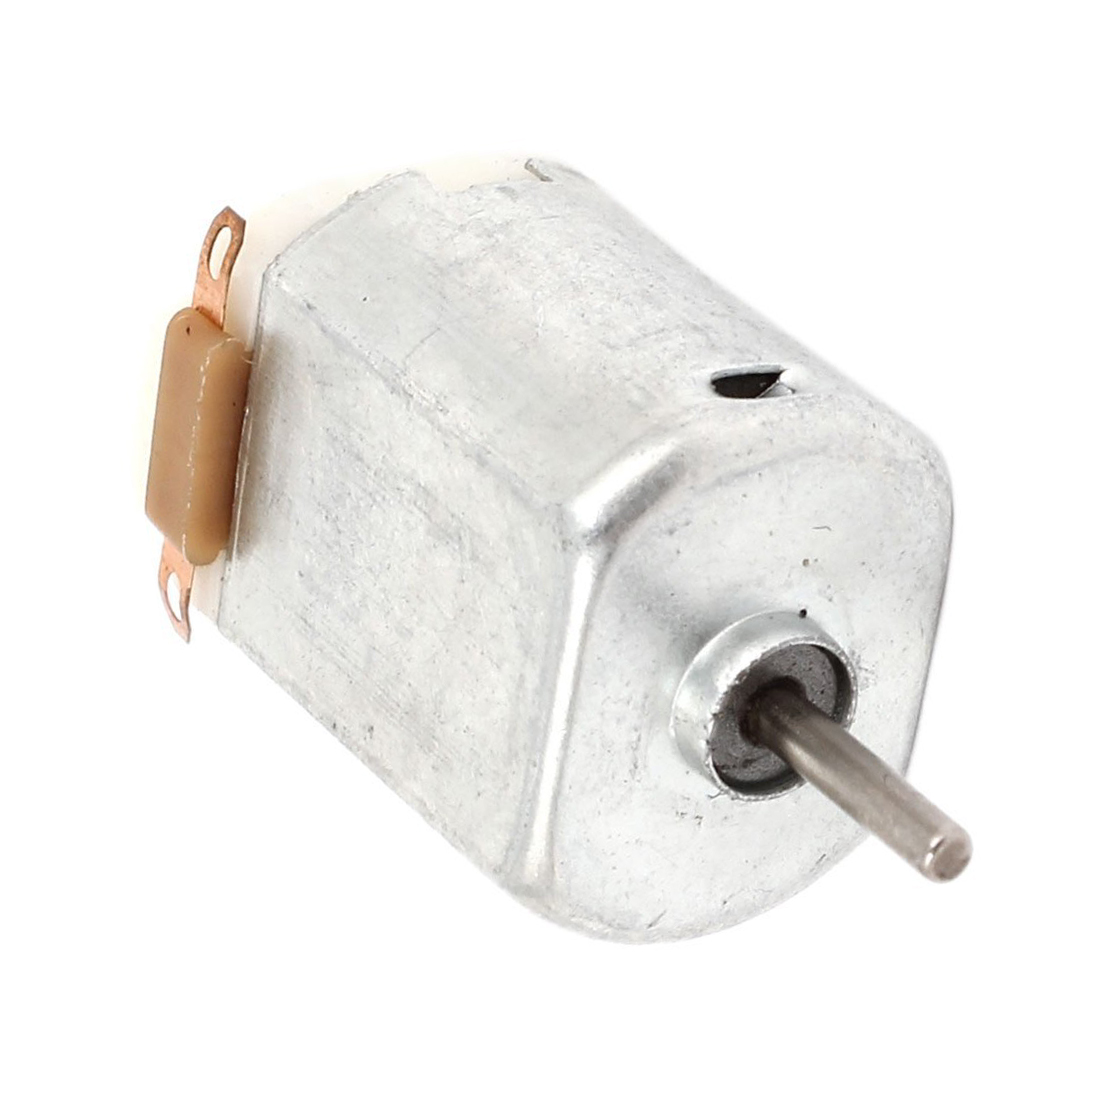 DC 1,5 v-3 v Mini Elektrische Motor 18000 rpm, DIY Spielzeug Hobby 30mm Durchmesser Massager Vibration Micro-Motor